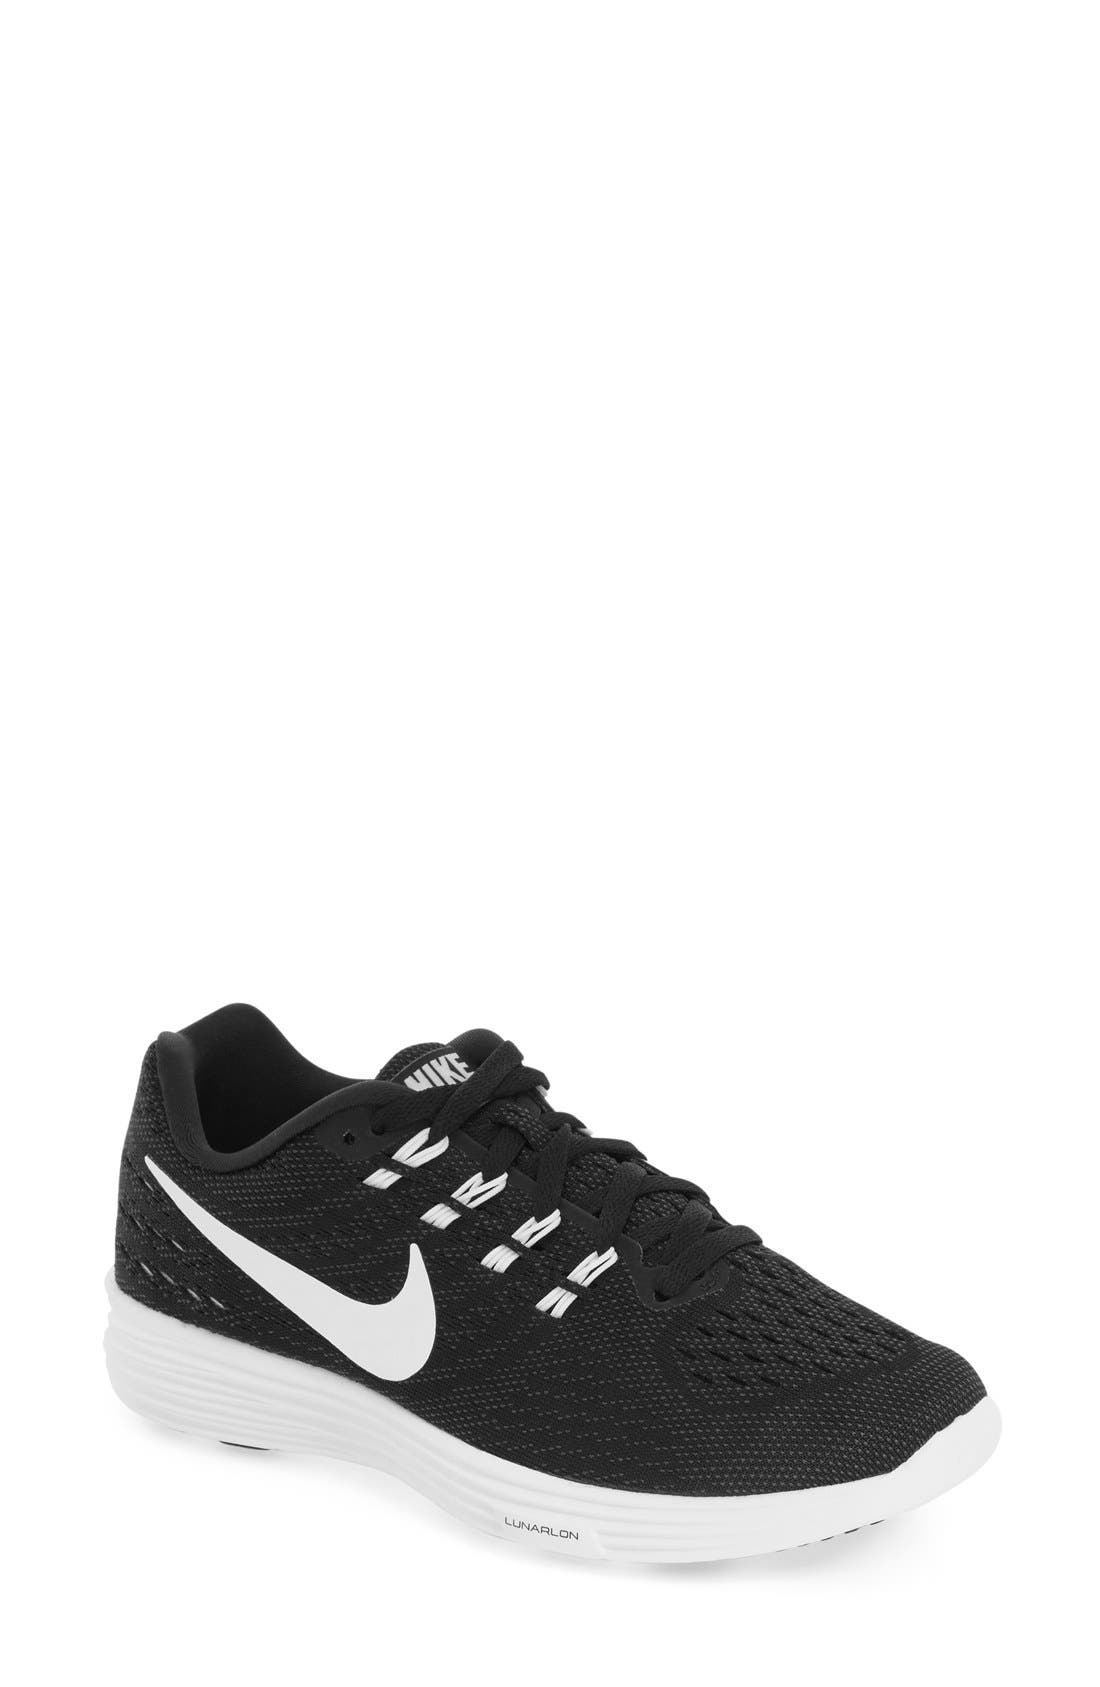 Alternate Image 1 Selected - Nike 'LunarTempo 2' Running Shoe (Women)